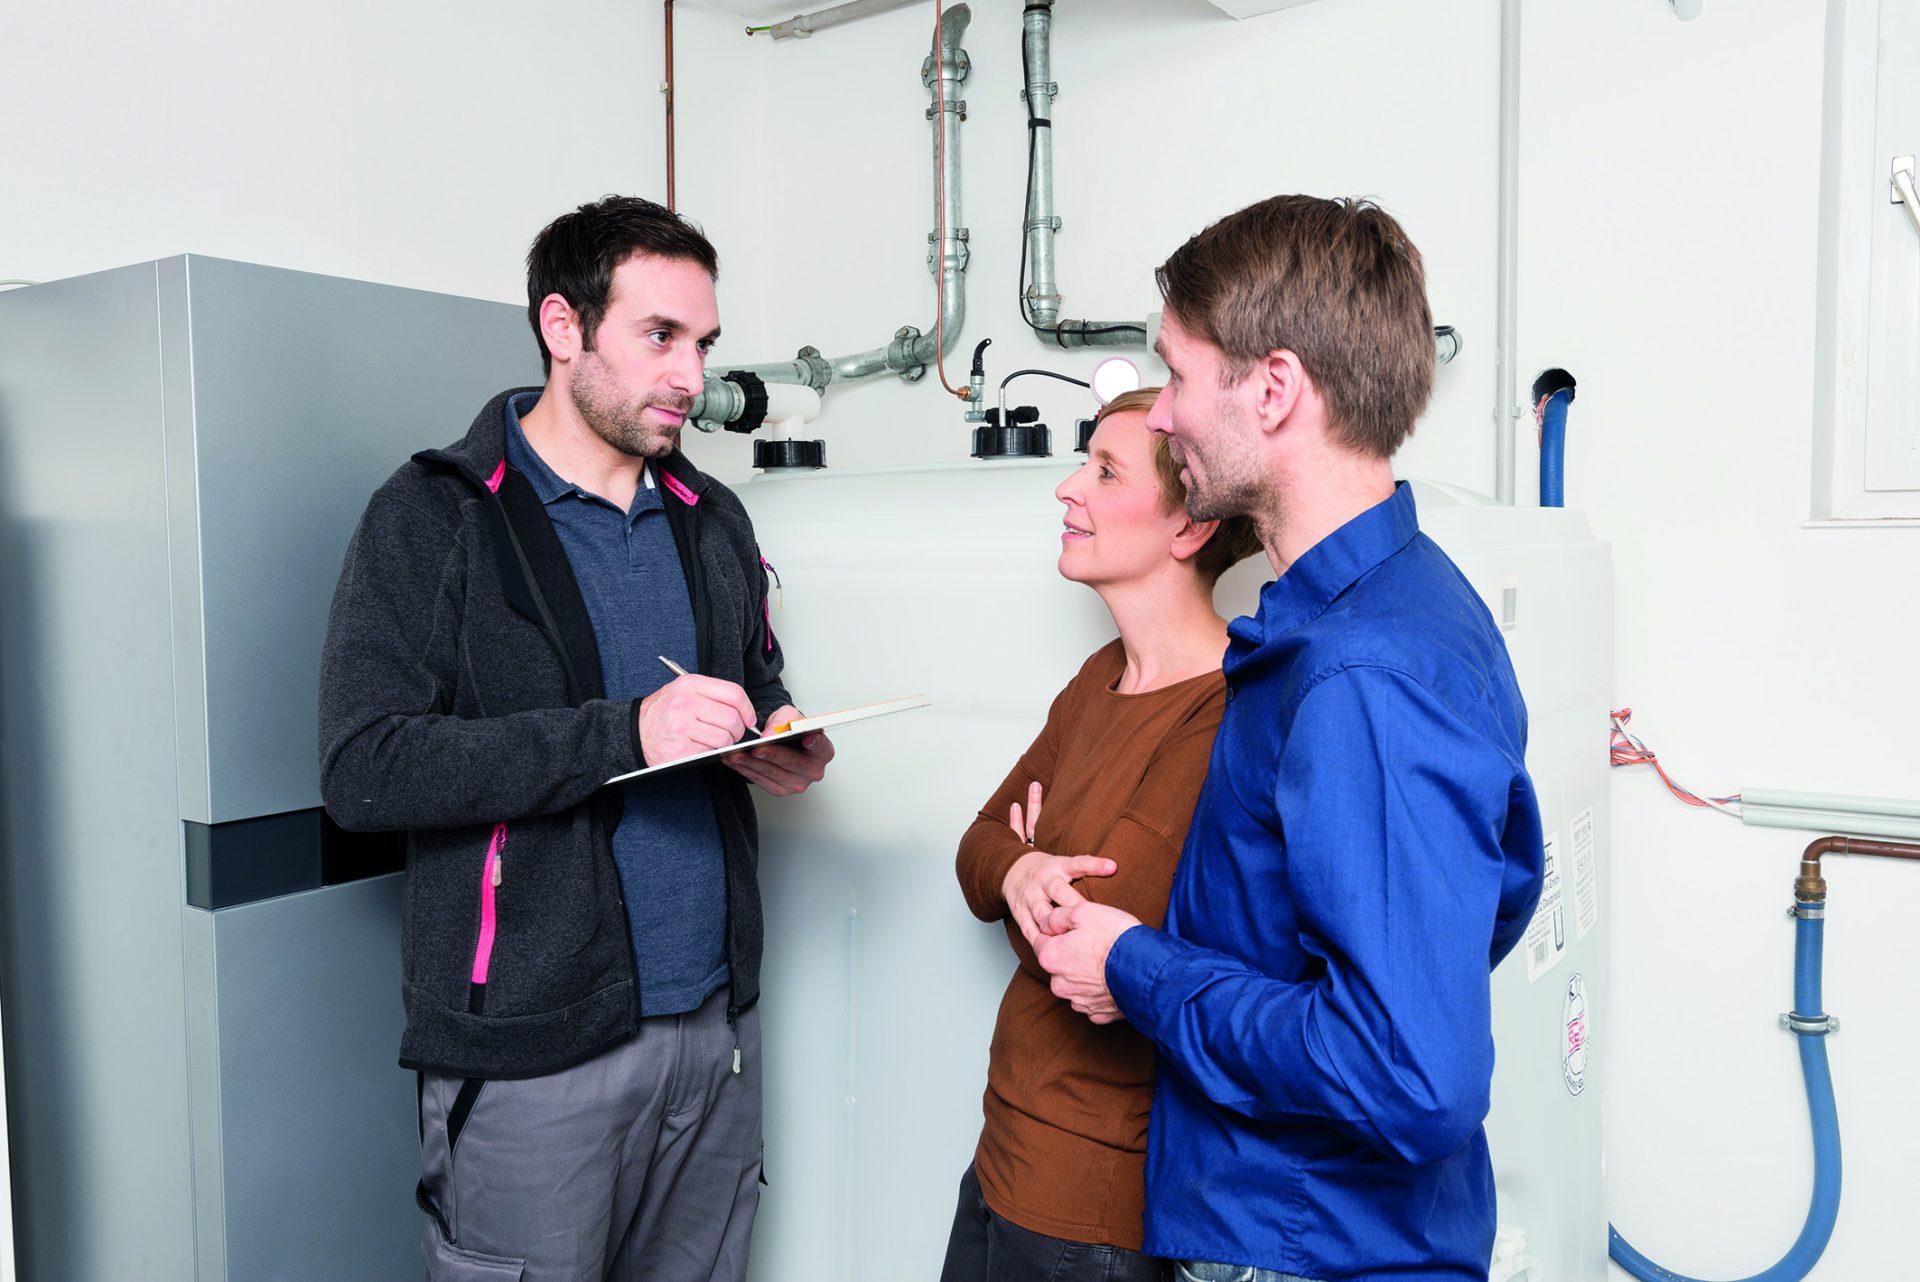 Heizungsmodernisierung: Brennwerttechnik Planungssicherheit